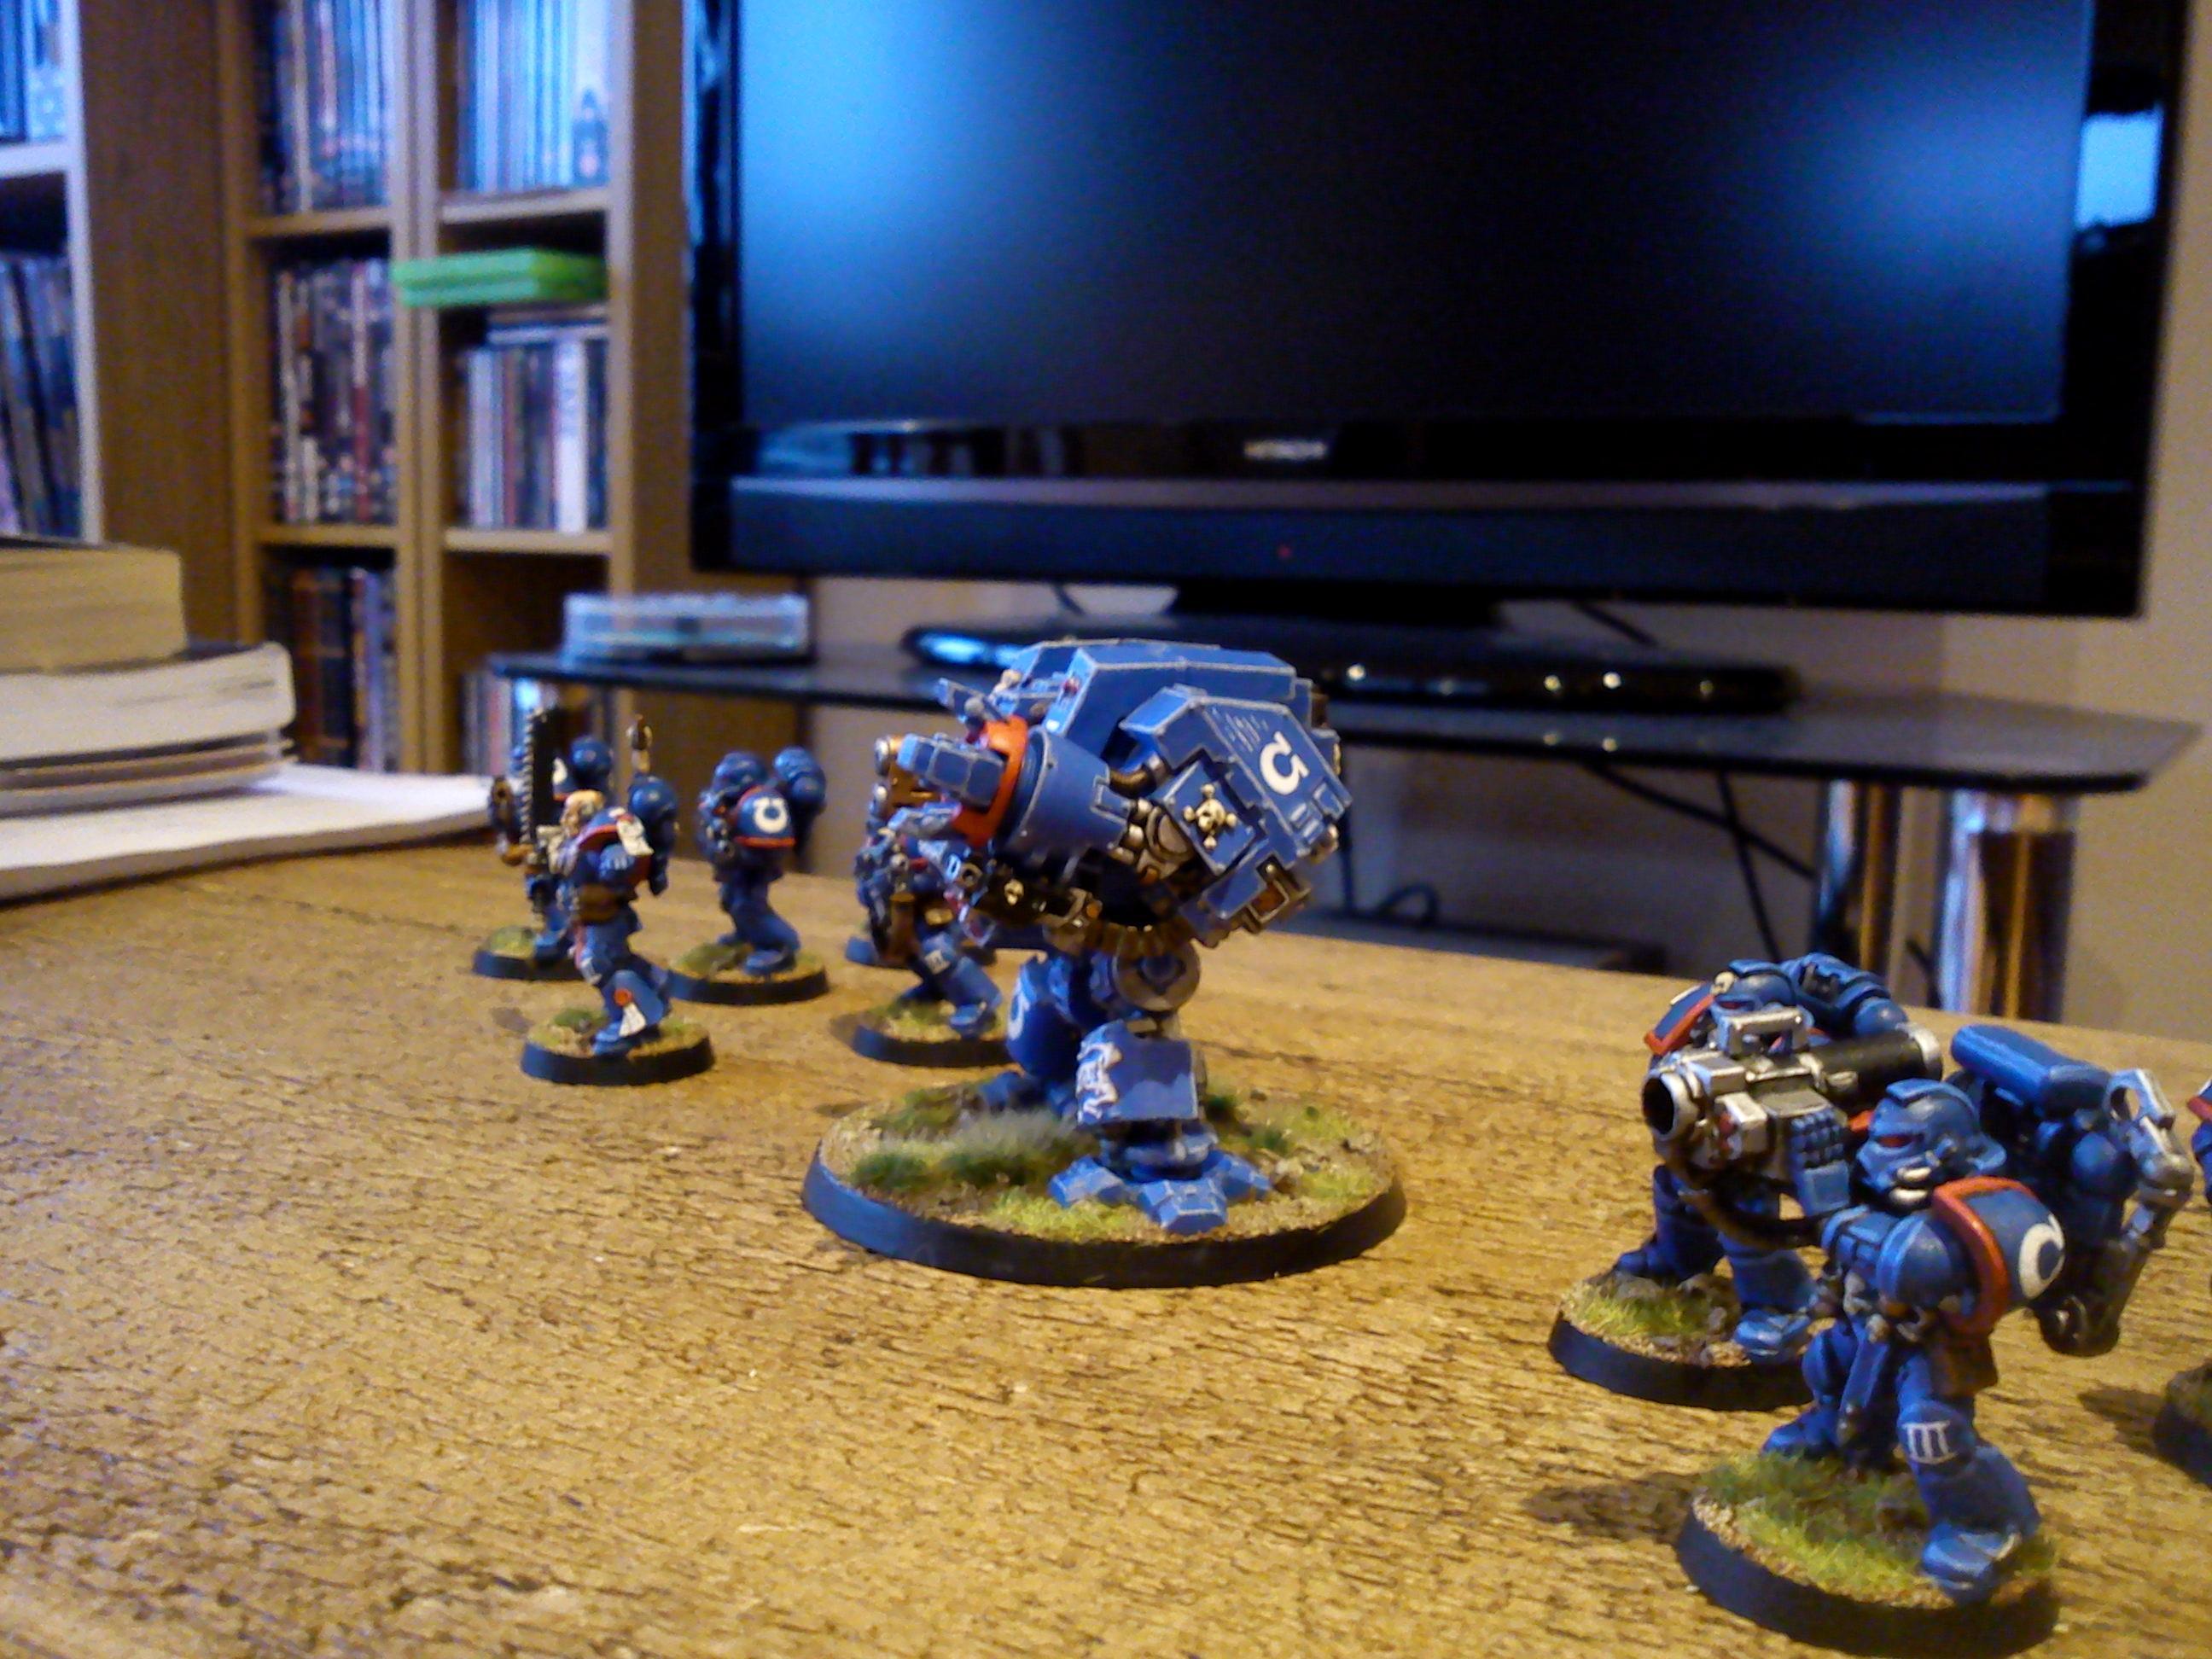 Army, Dreadnought, Space Marines, Ultramarines, Warhammer 40,000